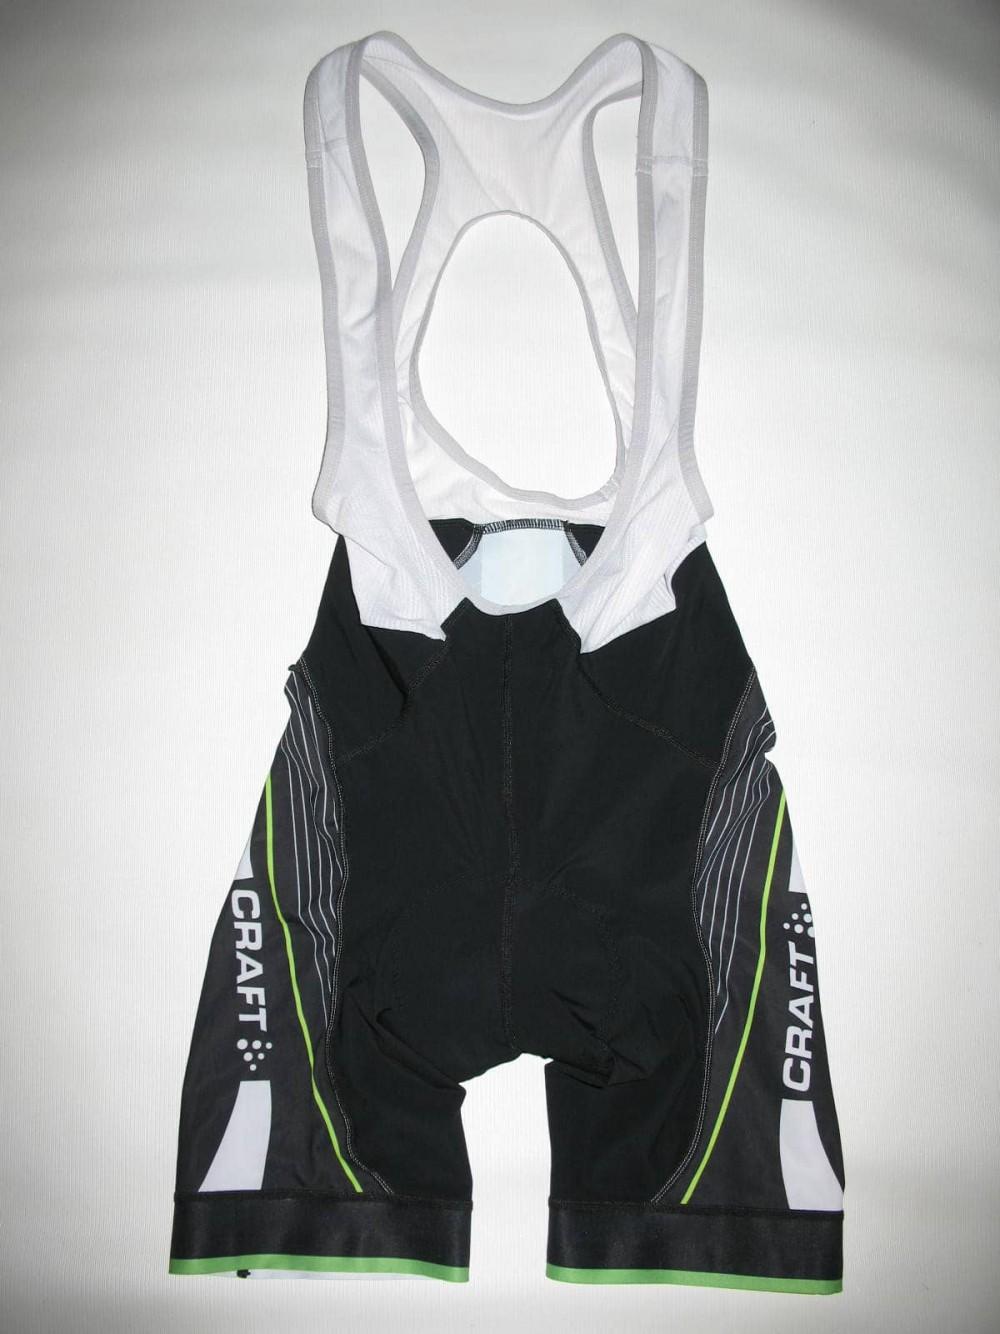 Велошорты CRAFT grand tour bib shorts (размер S) - 3